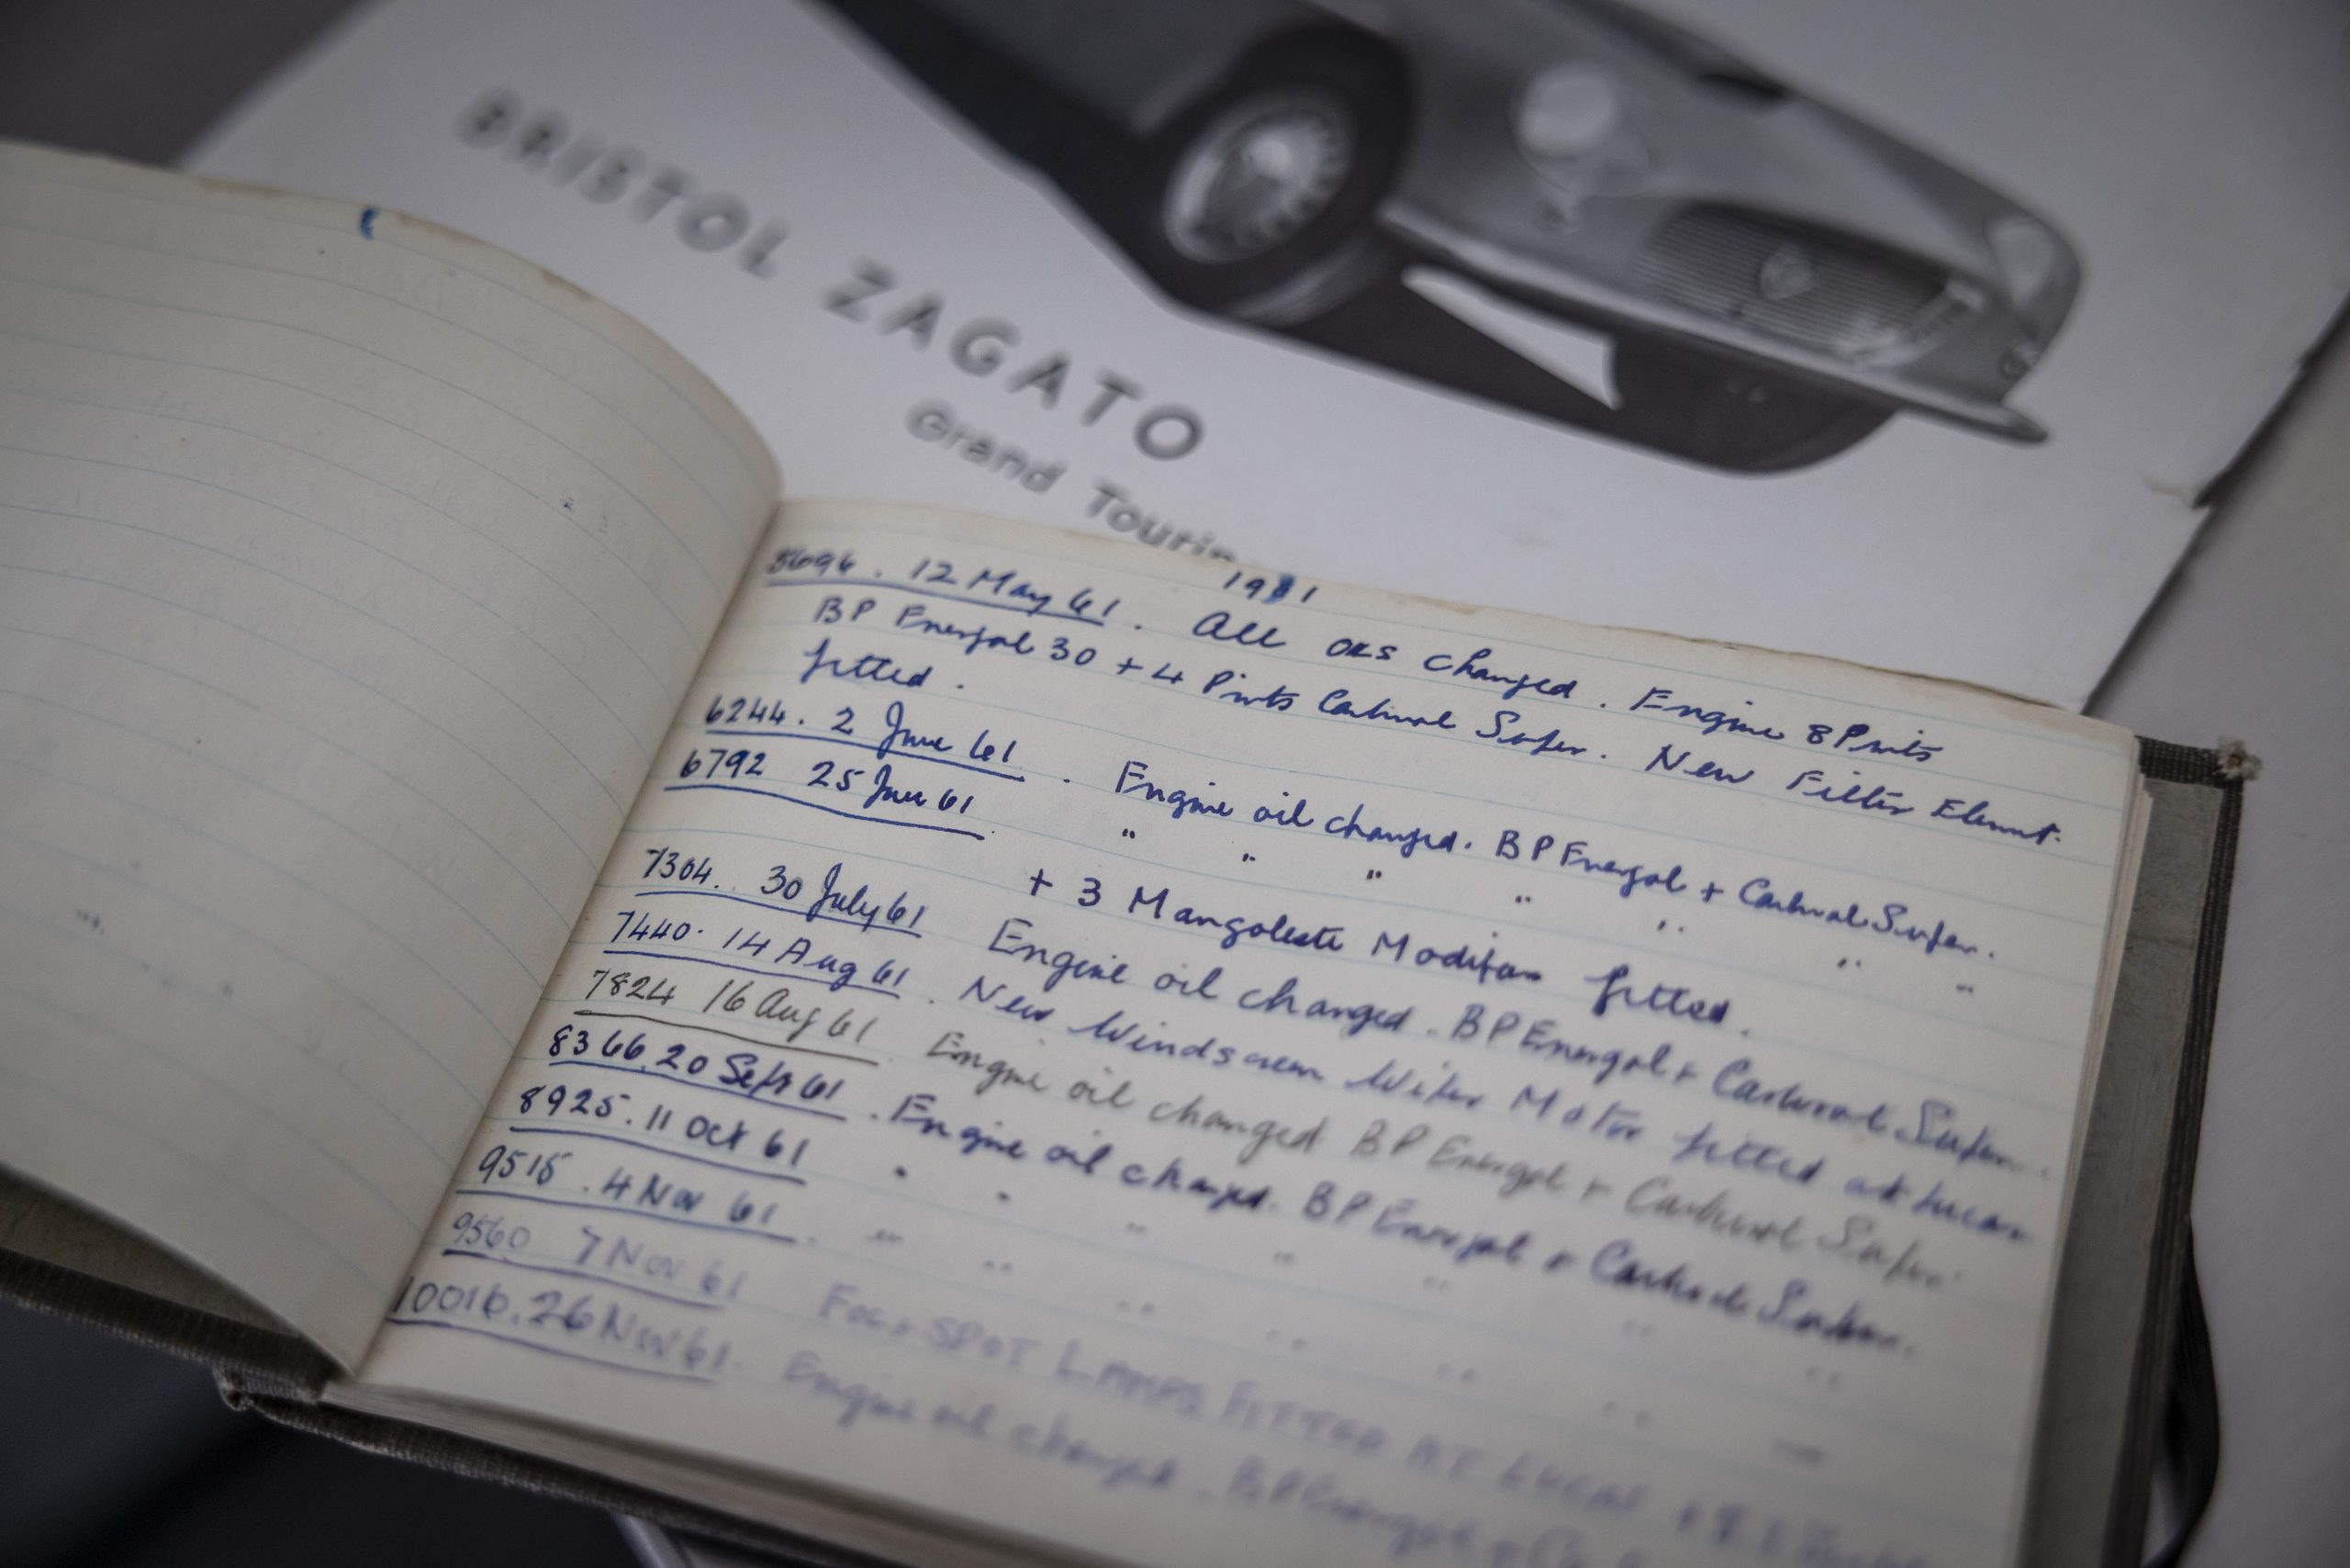 Zagato-bodied Bristol 406 log detail